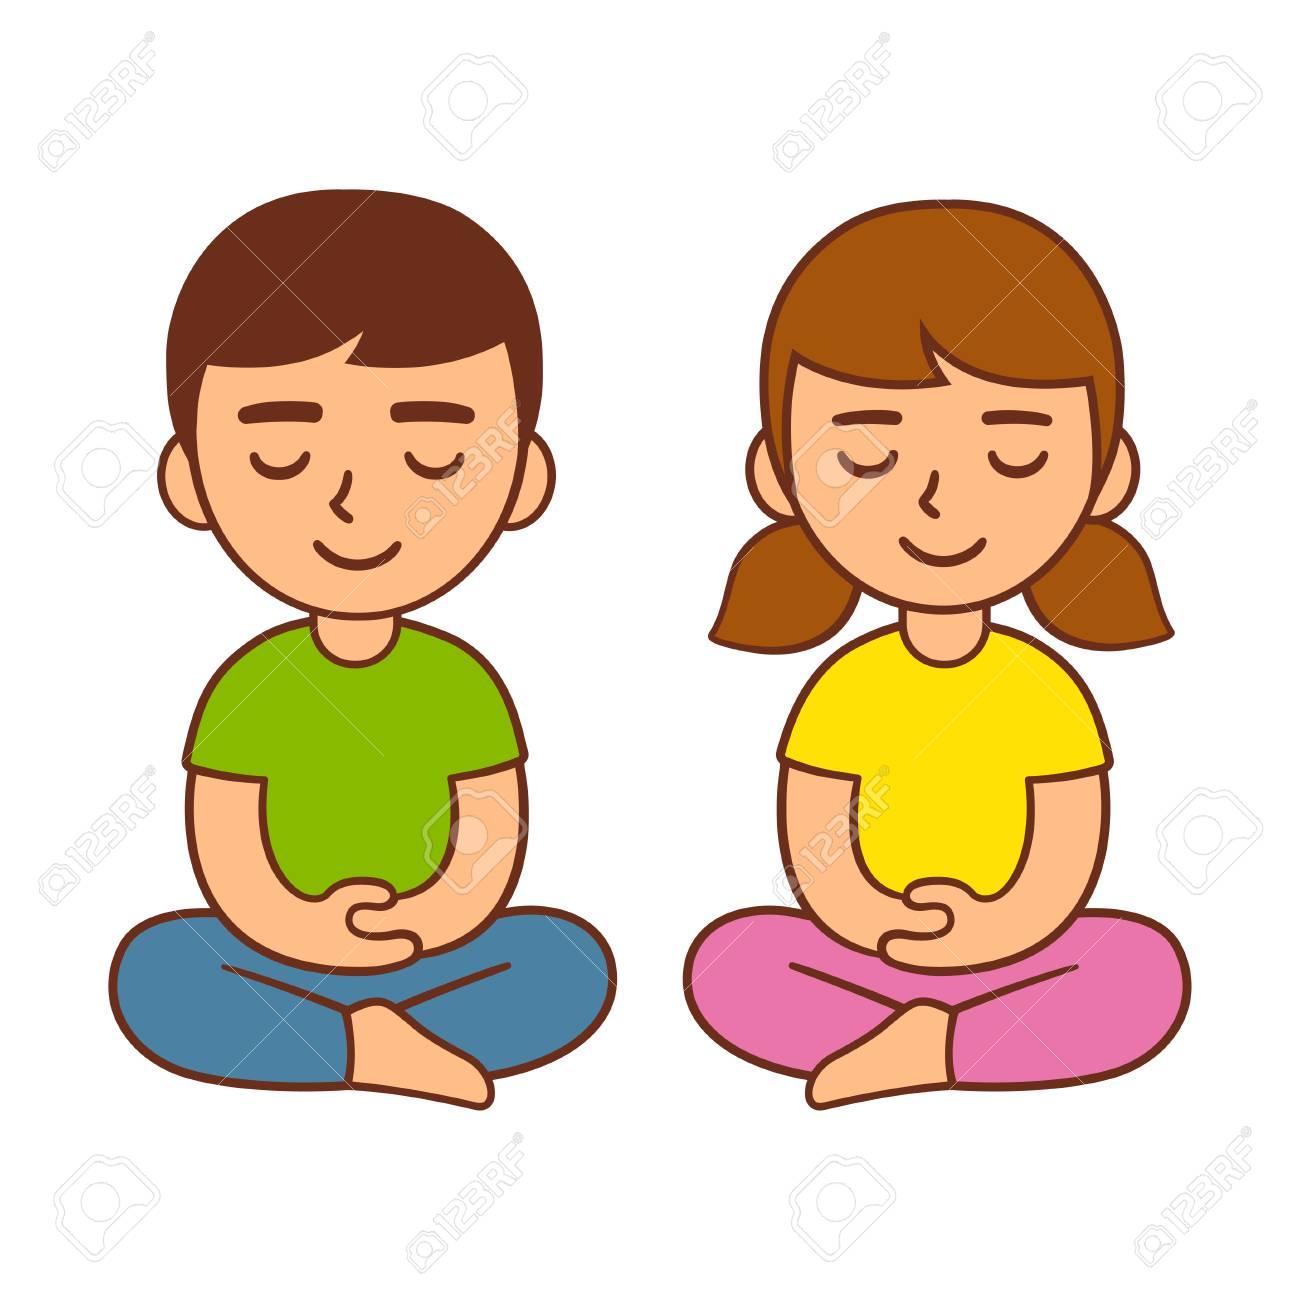 Meditation for kids, children mindfulness activity  Cute cartoon